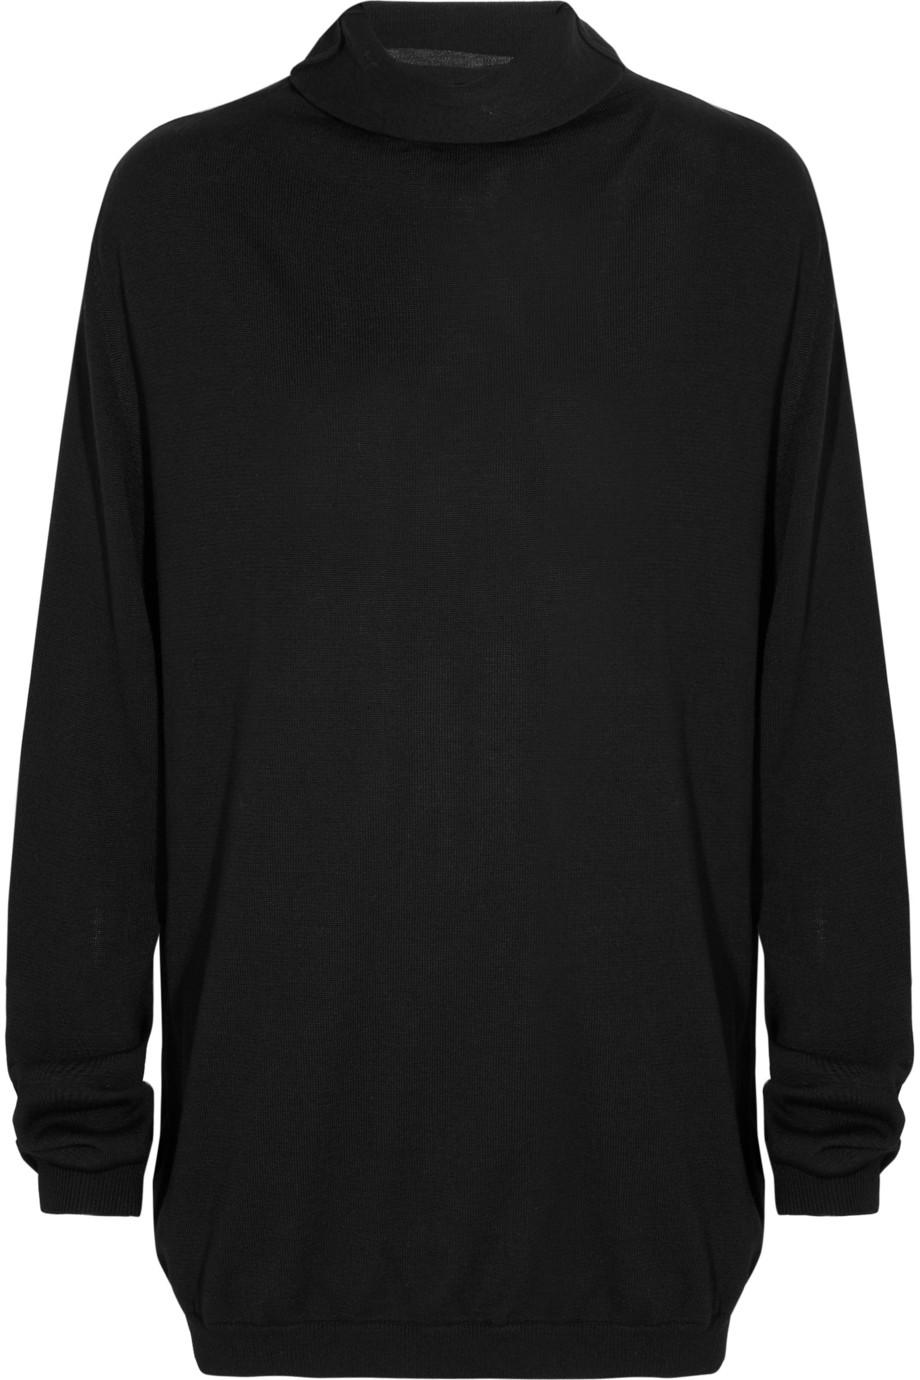 haider ackermann wool turtleneck sweater in black lyst. Black Bedroom Furniture Sets. Home Design Ideas